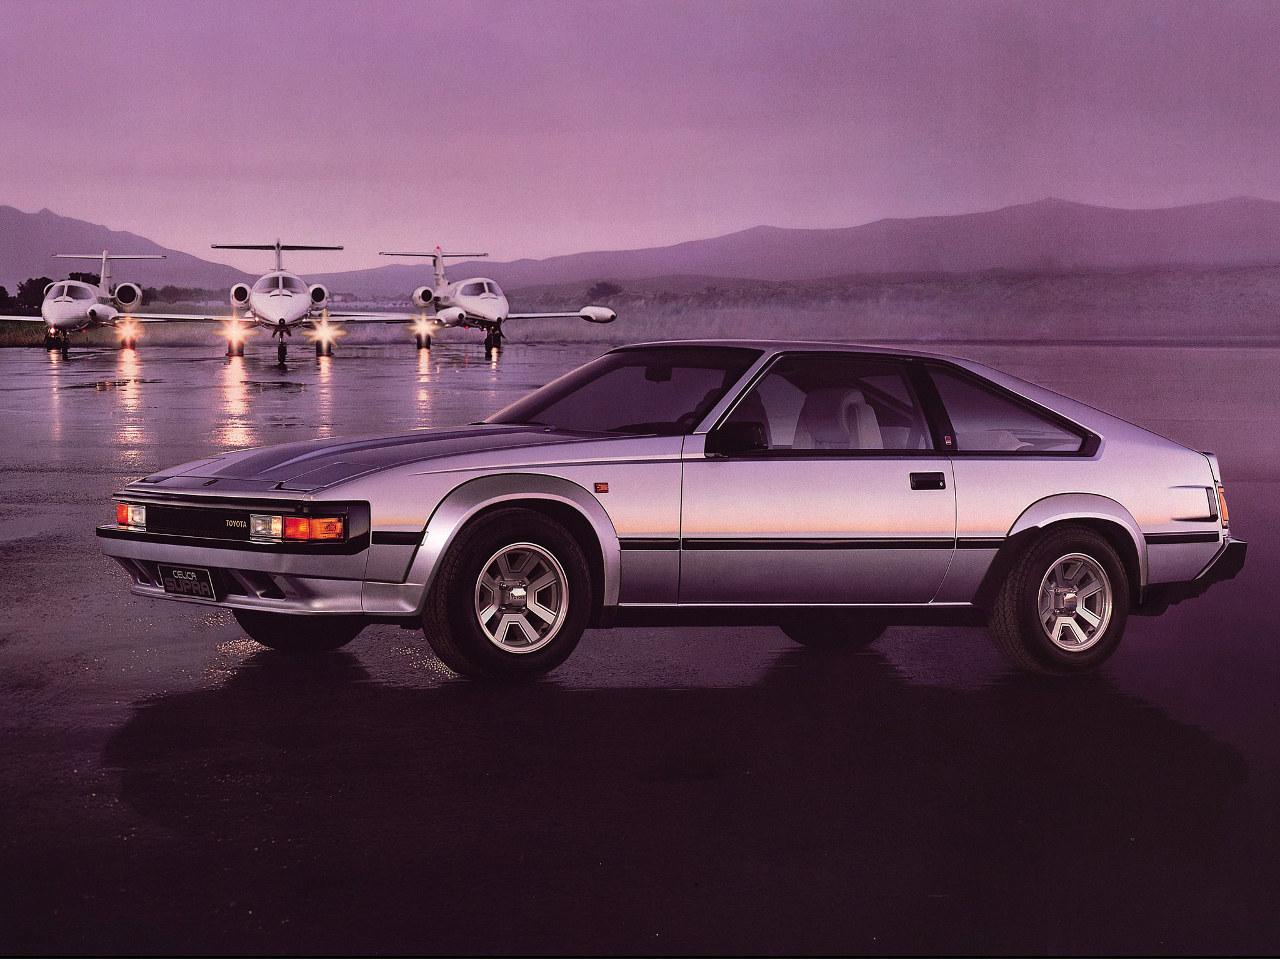 [Image: Toyota%2BCelica%2BSupra%2B2.8i%2B84%2B%2528eu%2529.jpg]